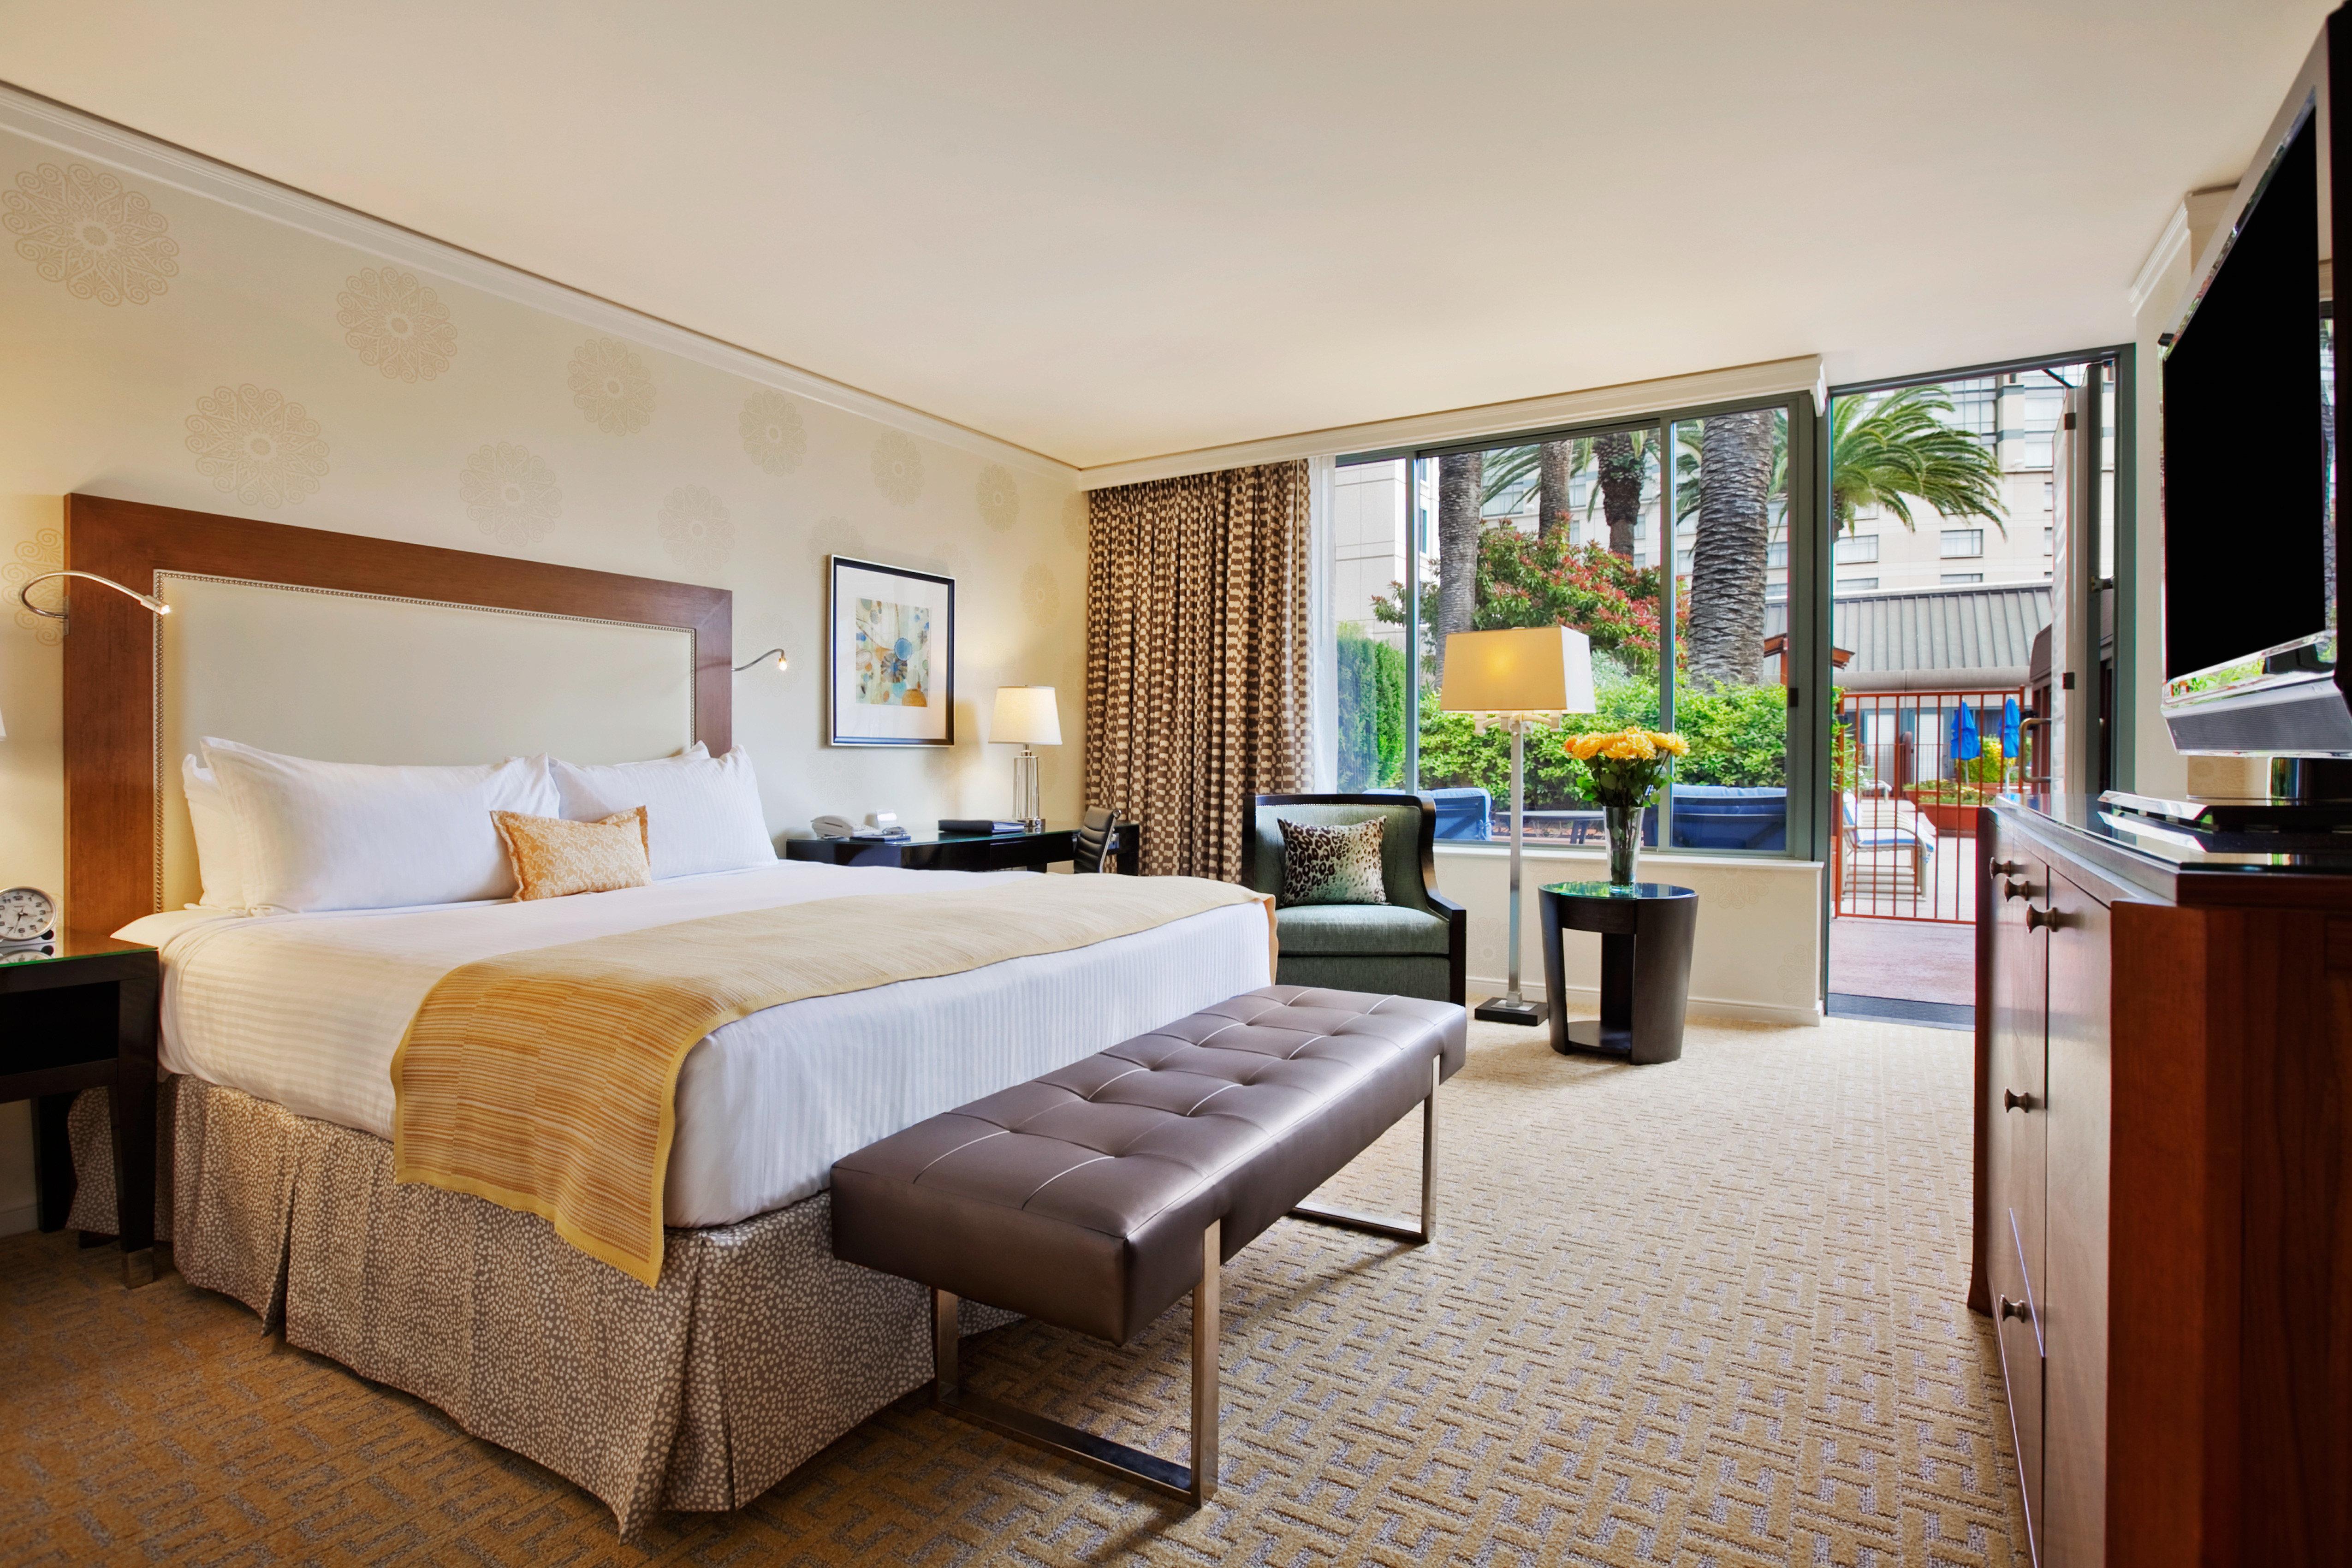 Bedroom Classic Hotels Luxury Travel Patio property Suite condominium home Villa hardwood cottage living room